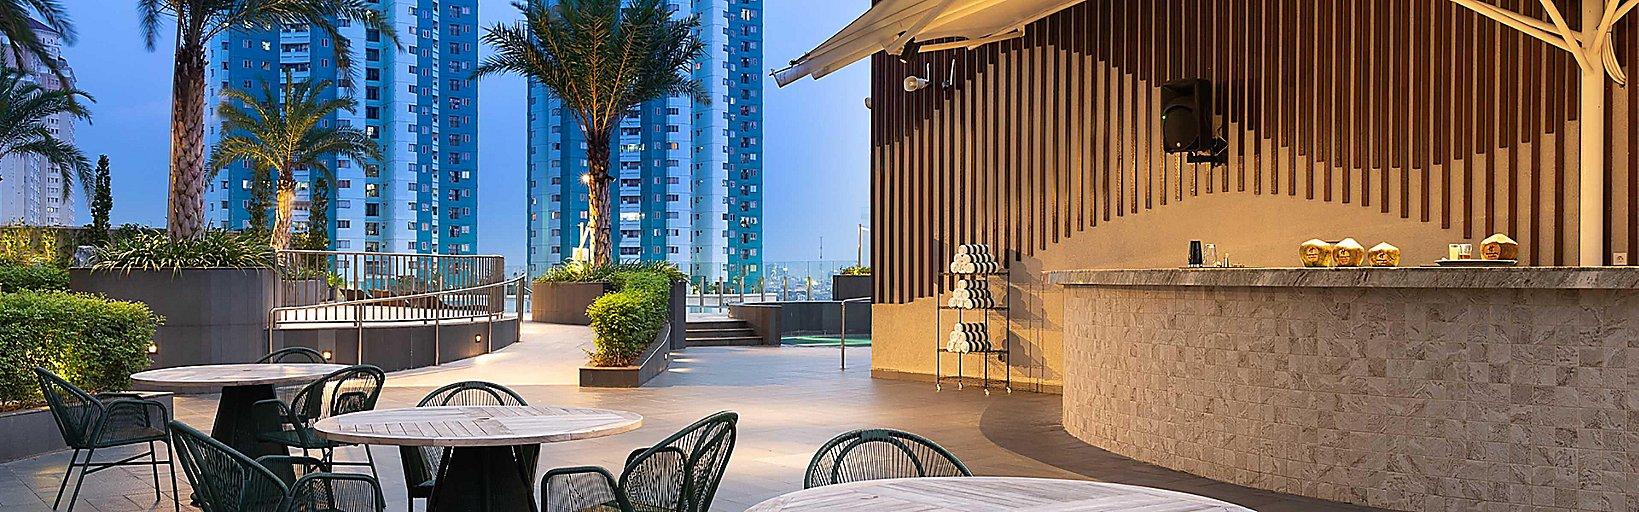 Restaurants Near Holiday Inn Hotel Suites Jakarta Gajah Mada